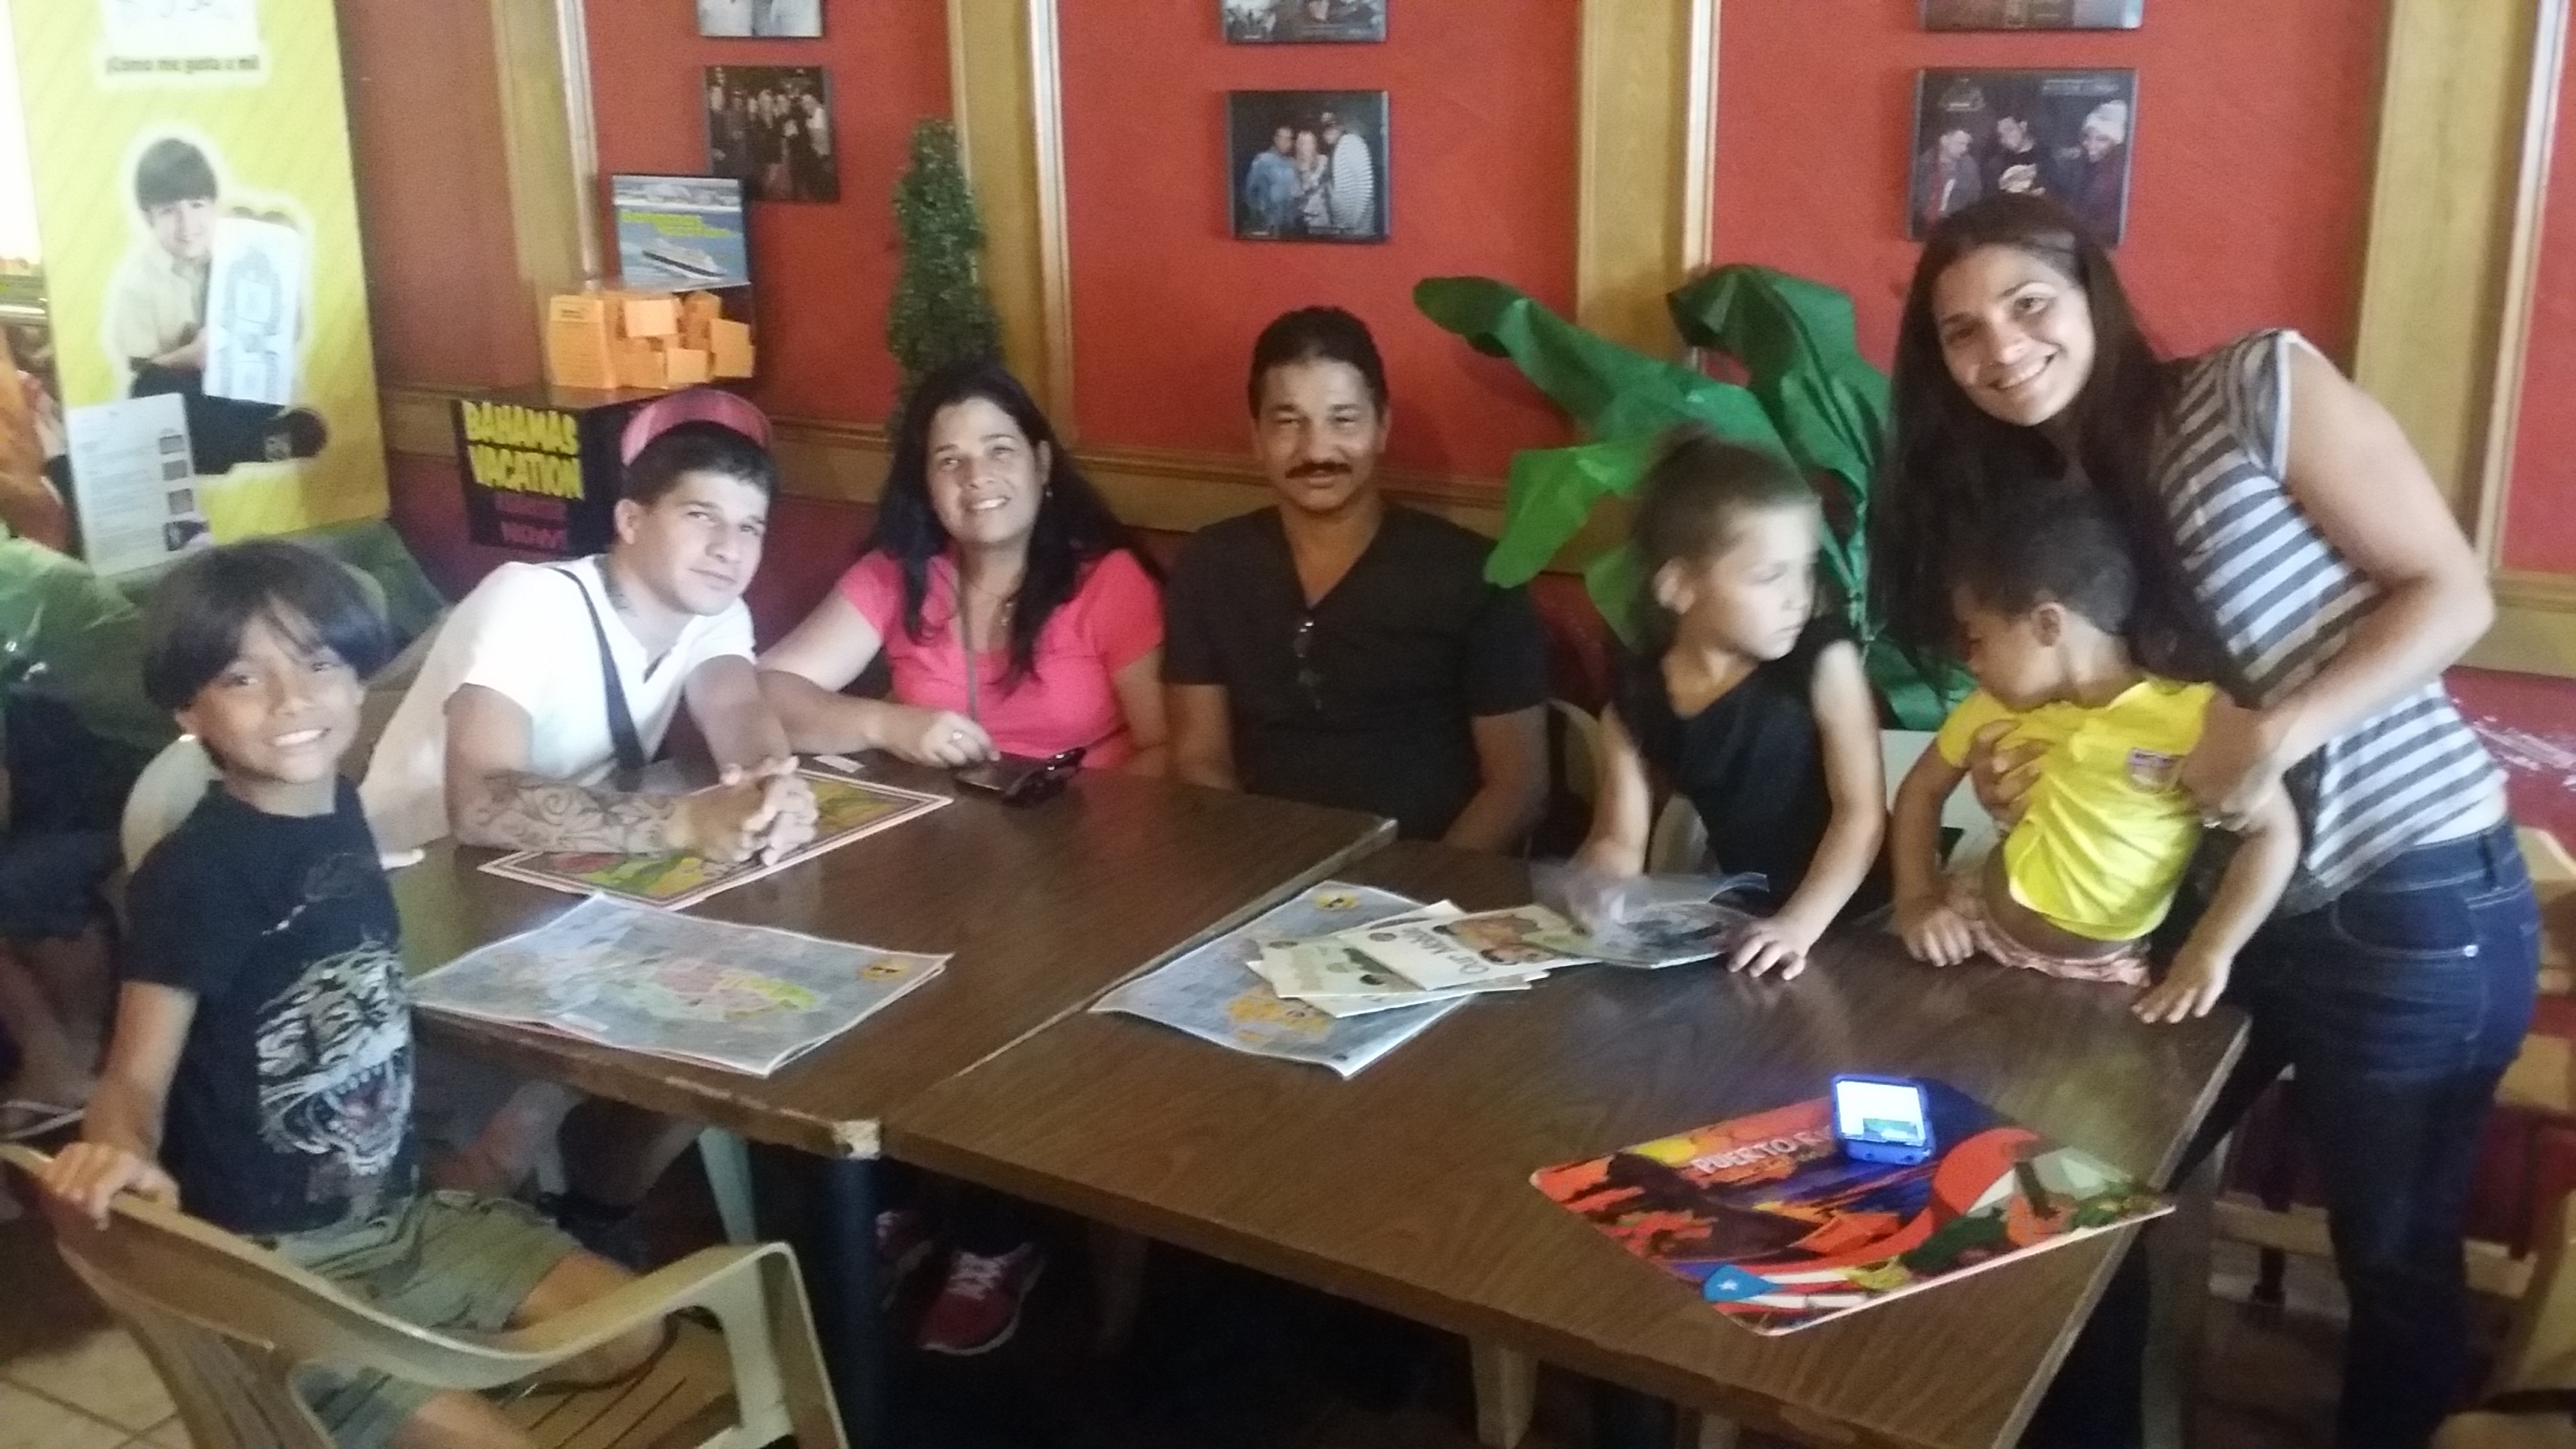 Beutiful Family